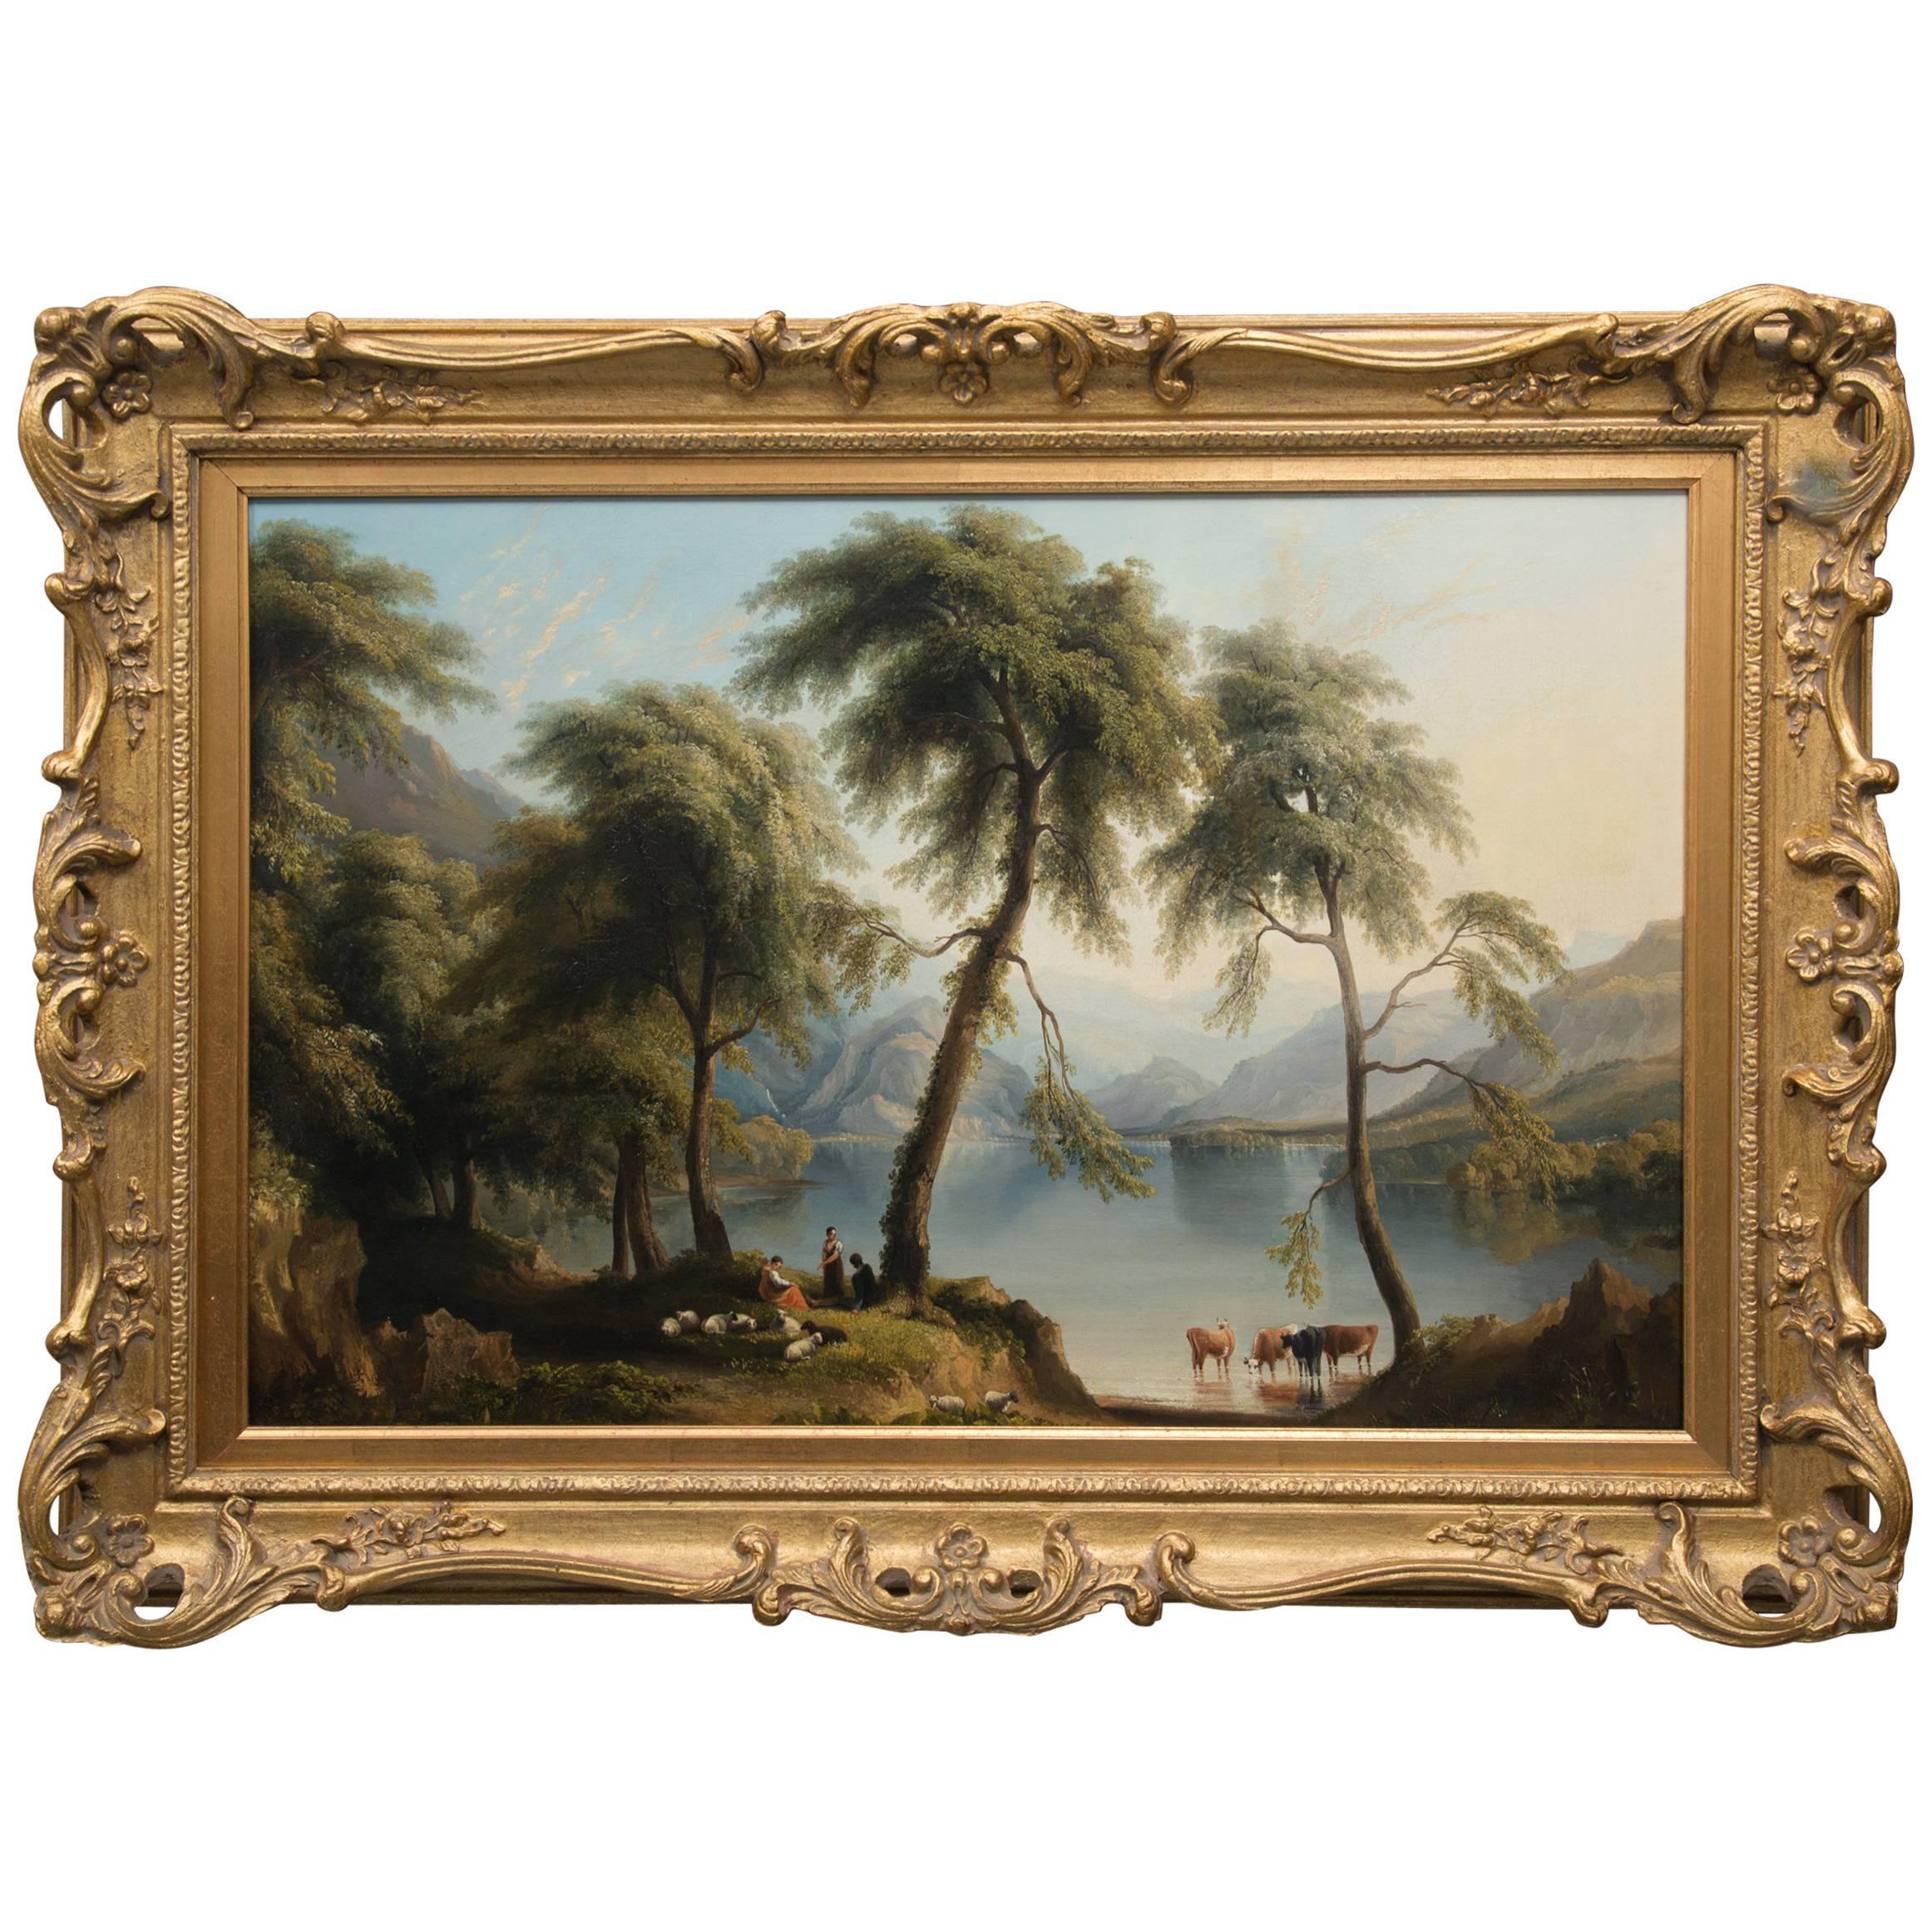 19th Century Oil on Canvas of Italian Landscape